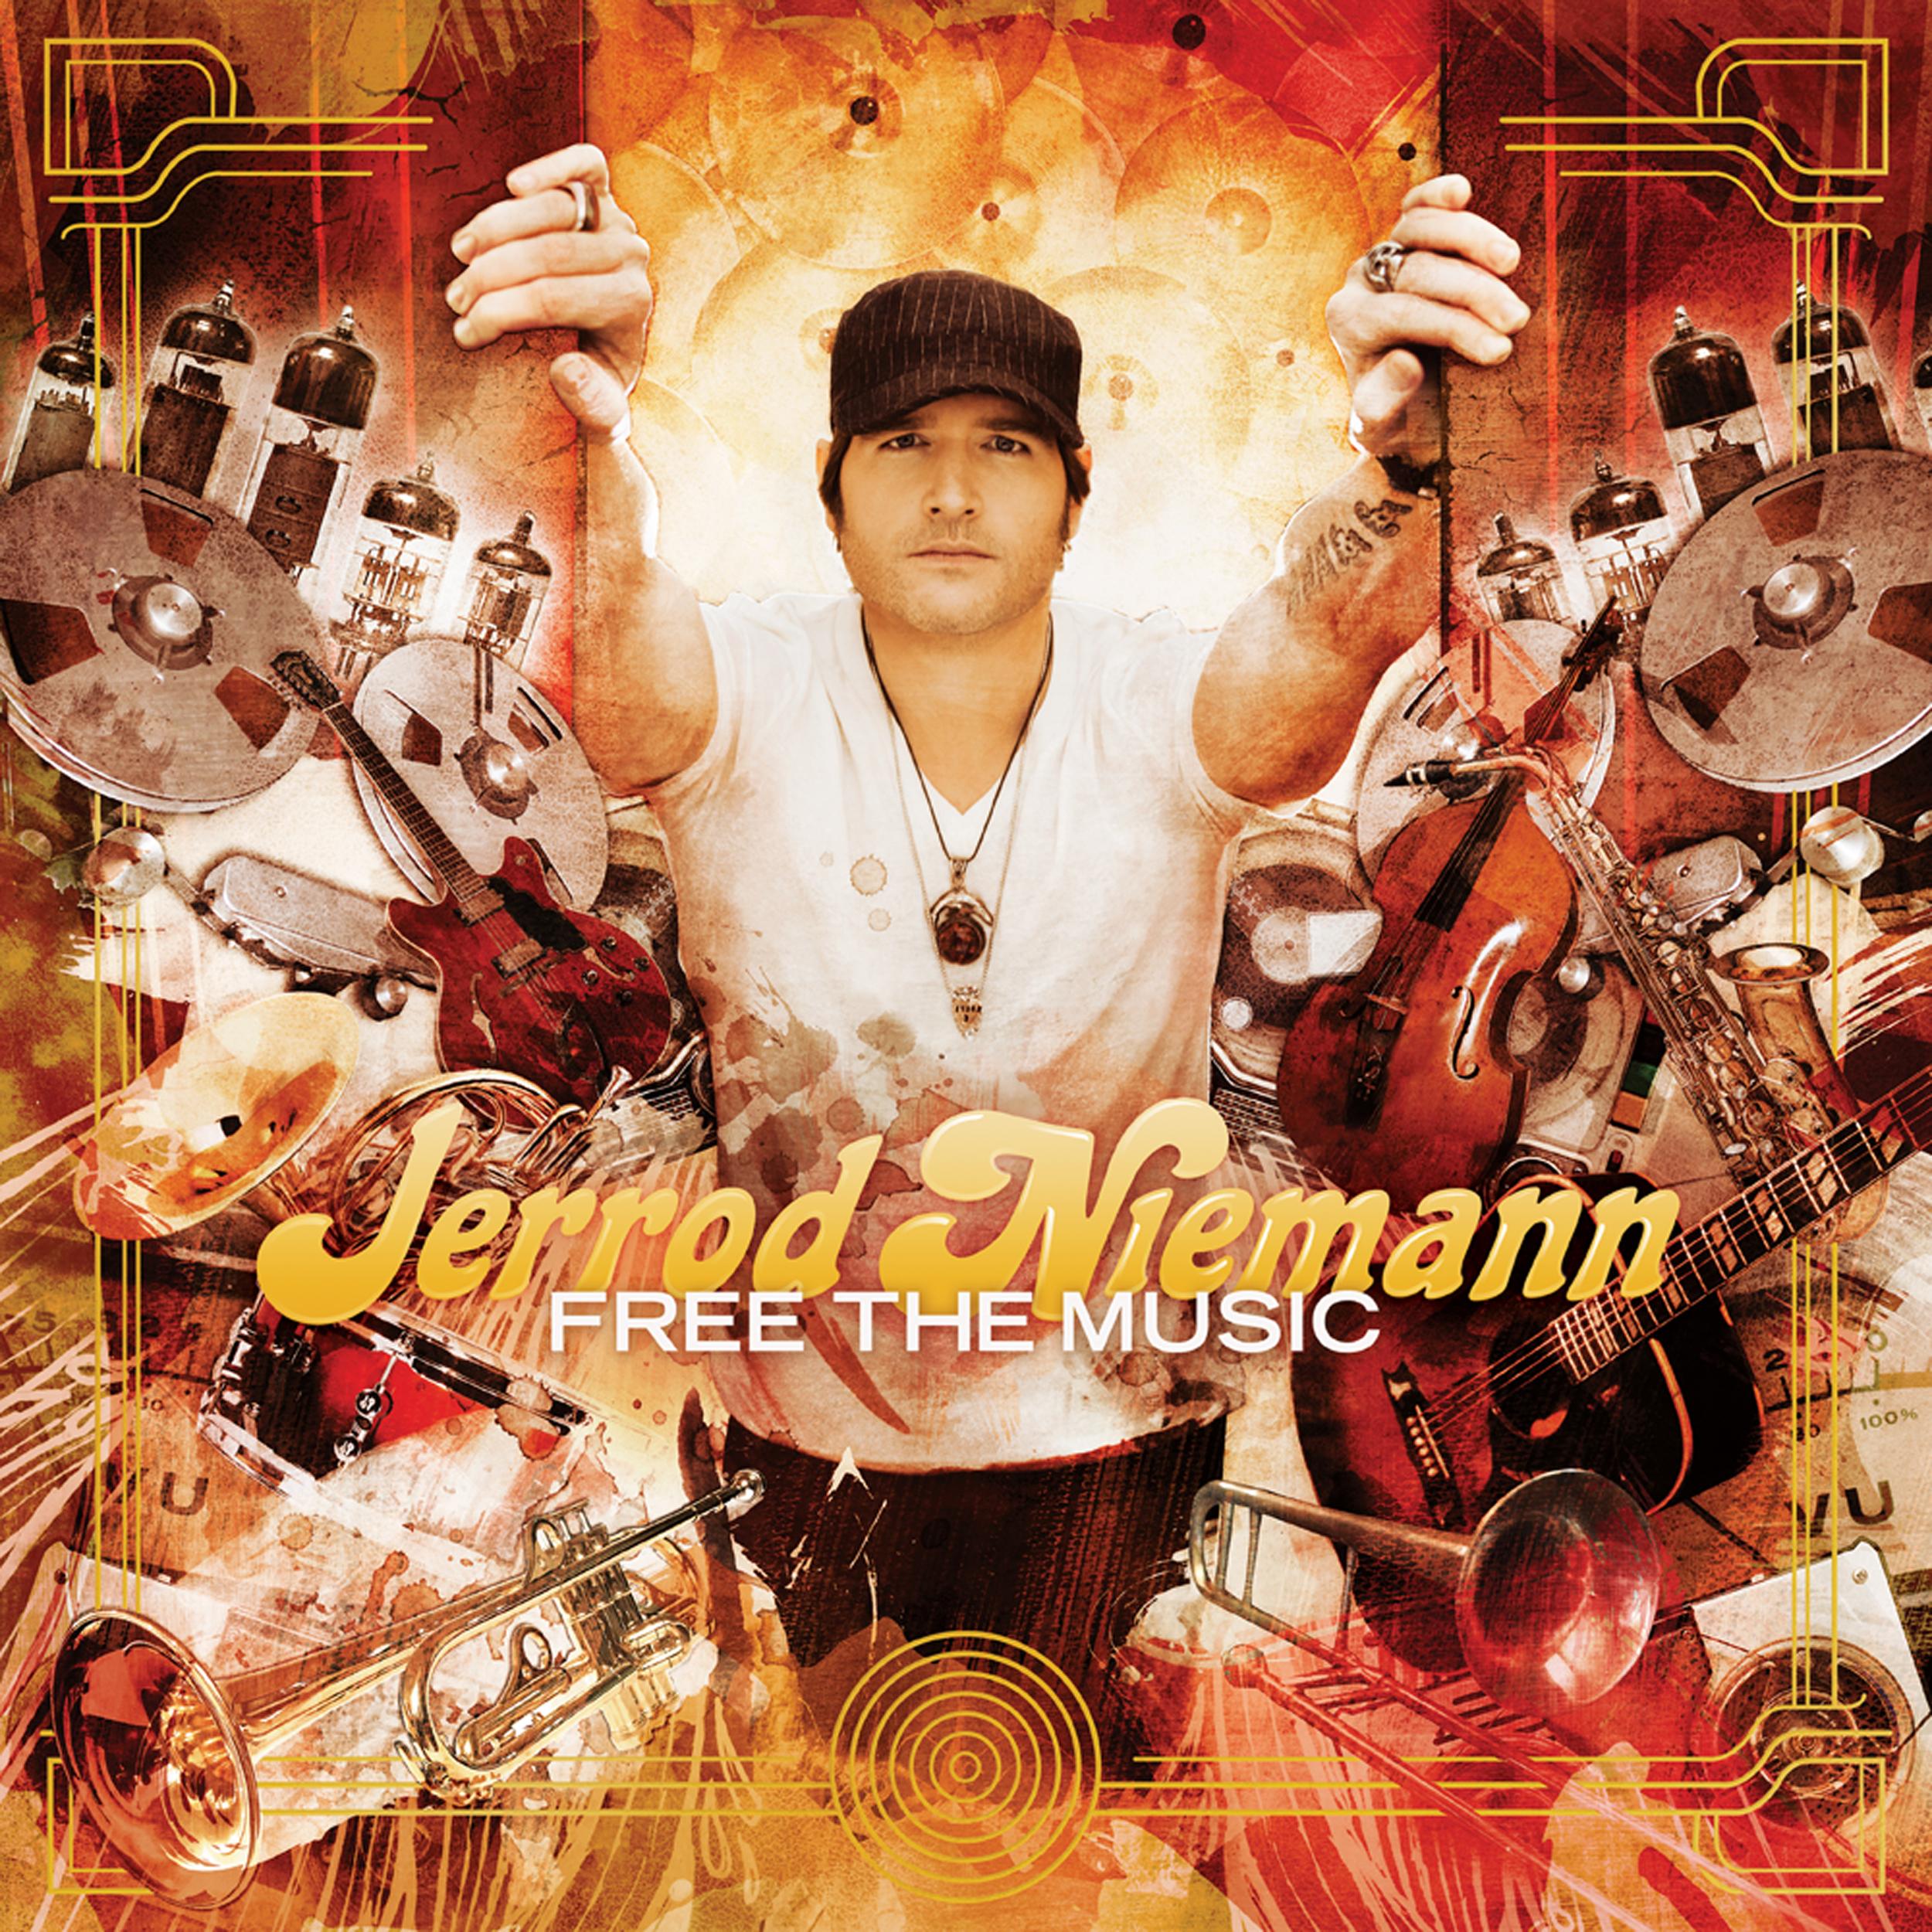 Jerrod Niemann Free The Music